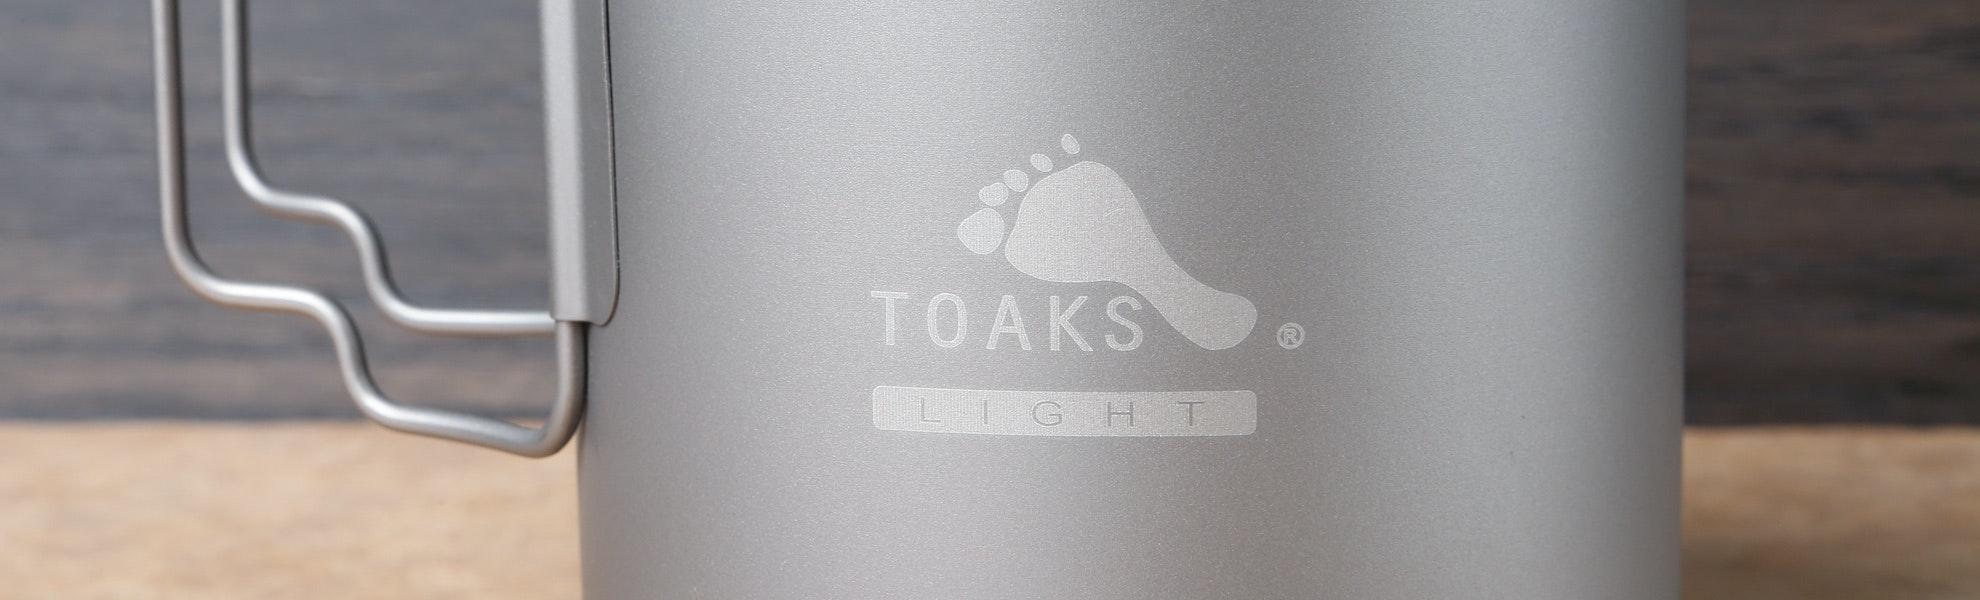 Toaks Light Titanium 650 ml Pot